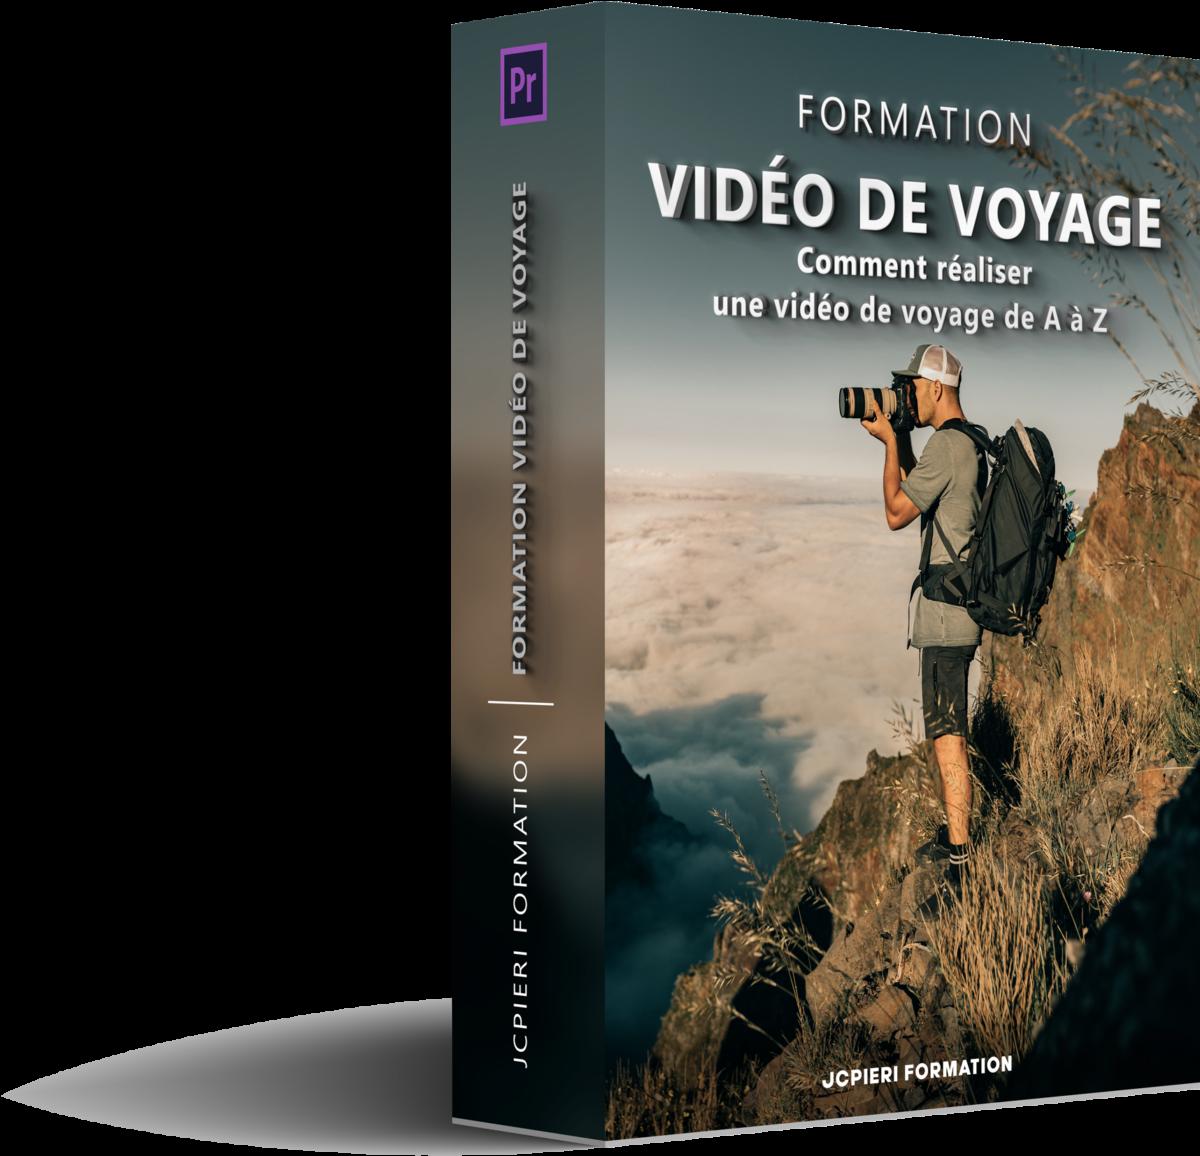 formation video voyage